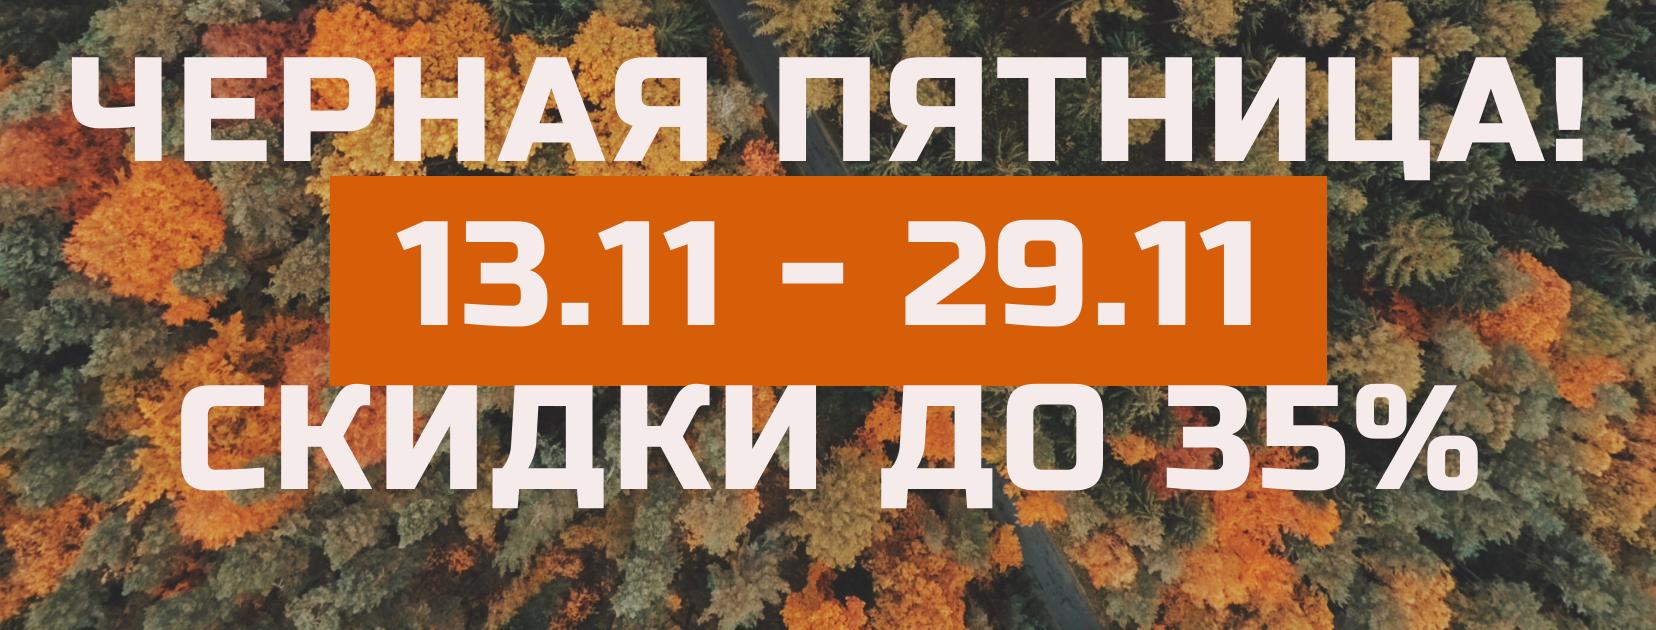 Черная Пятница - Распродажа! 13.11 - 29.11